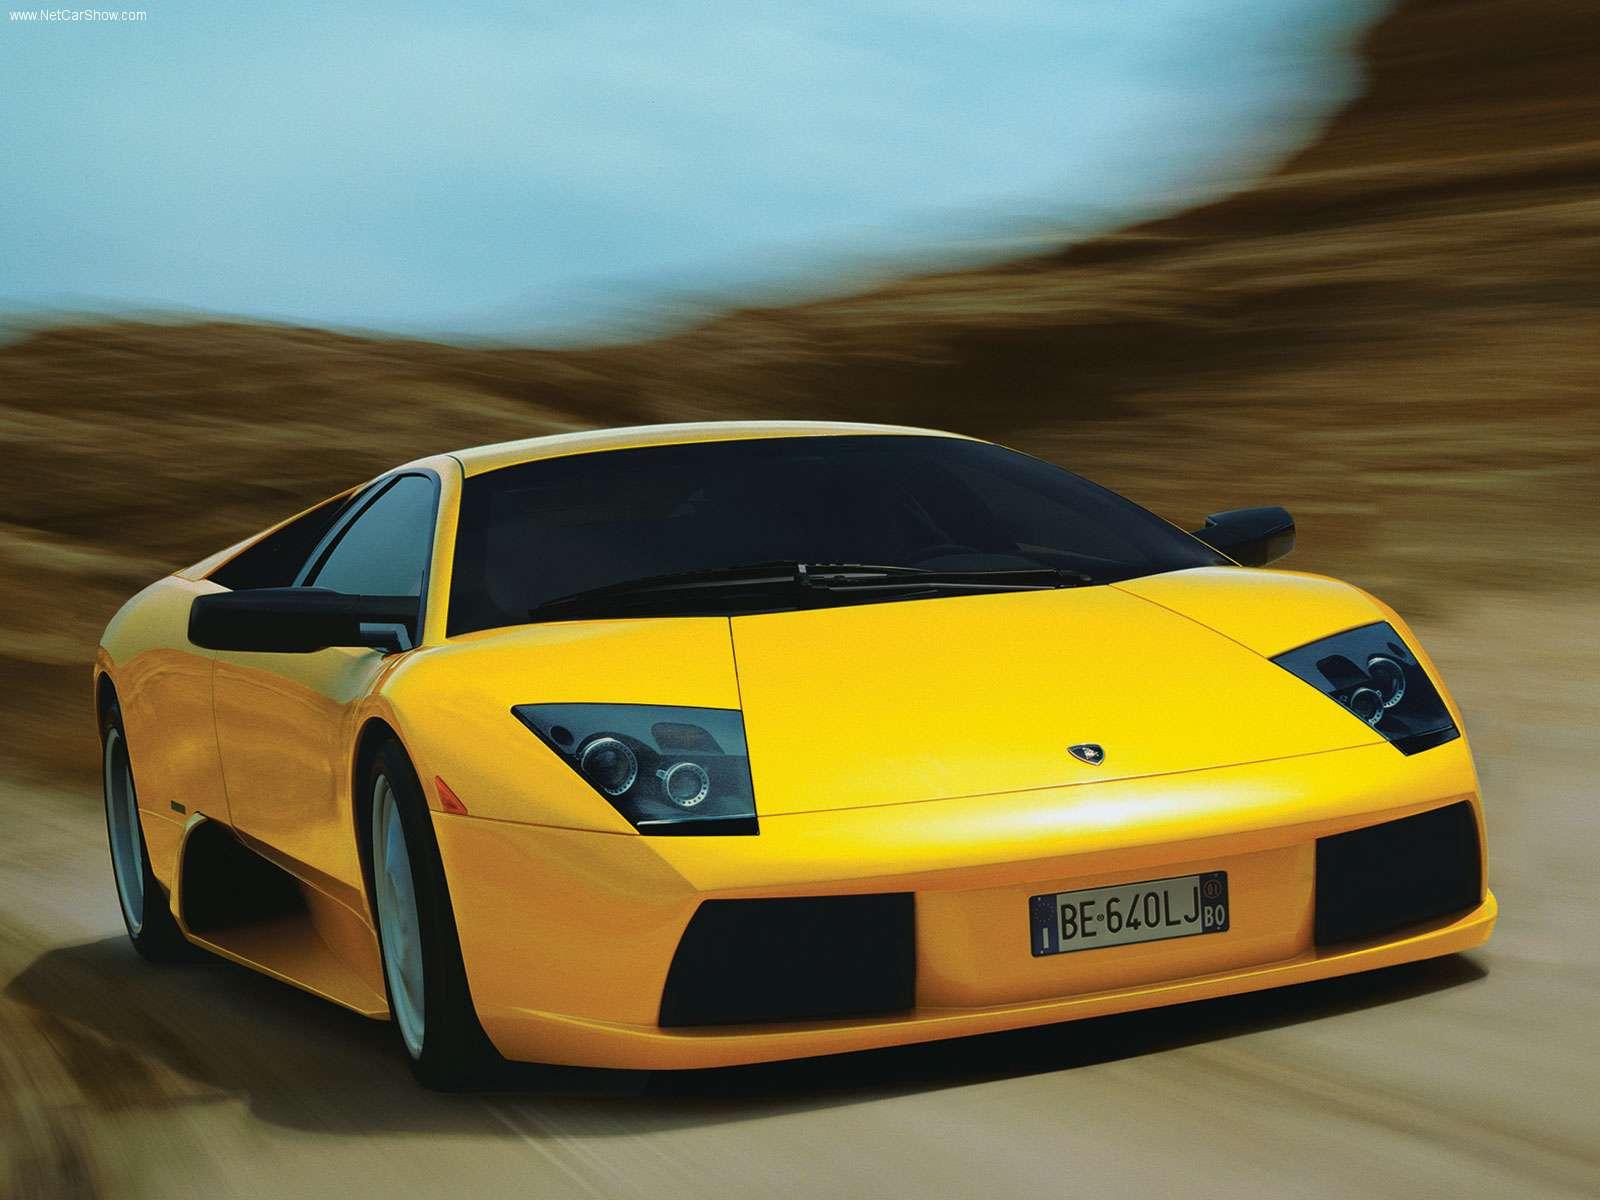 Lamborghini Murcielago Wallpapers - Wallpaper Cave